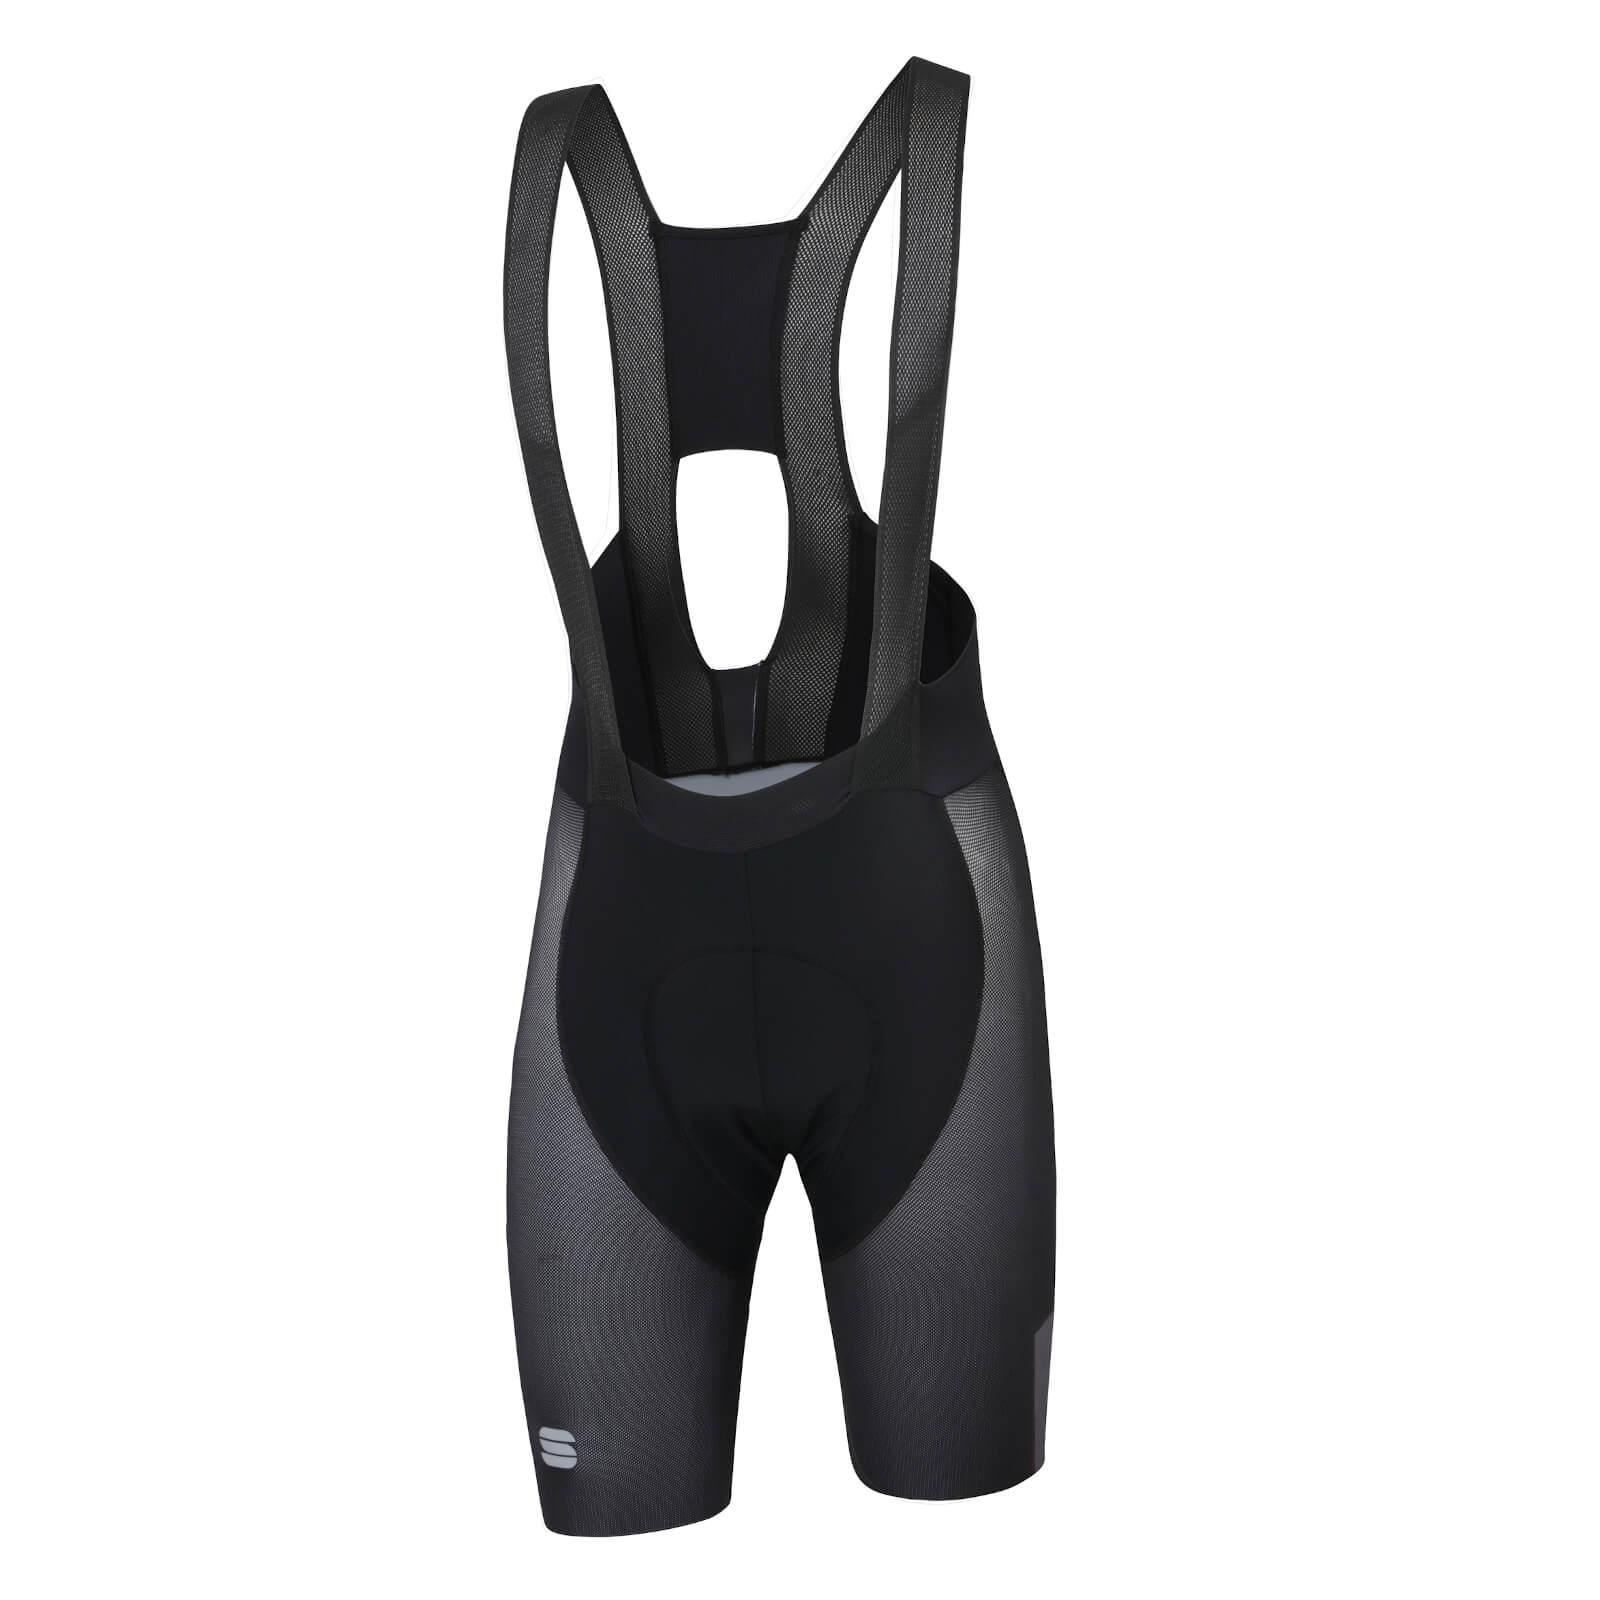 Sportful BodyFit Pro Air Bib Shorts - L - Black/Anthracite